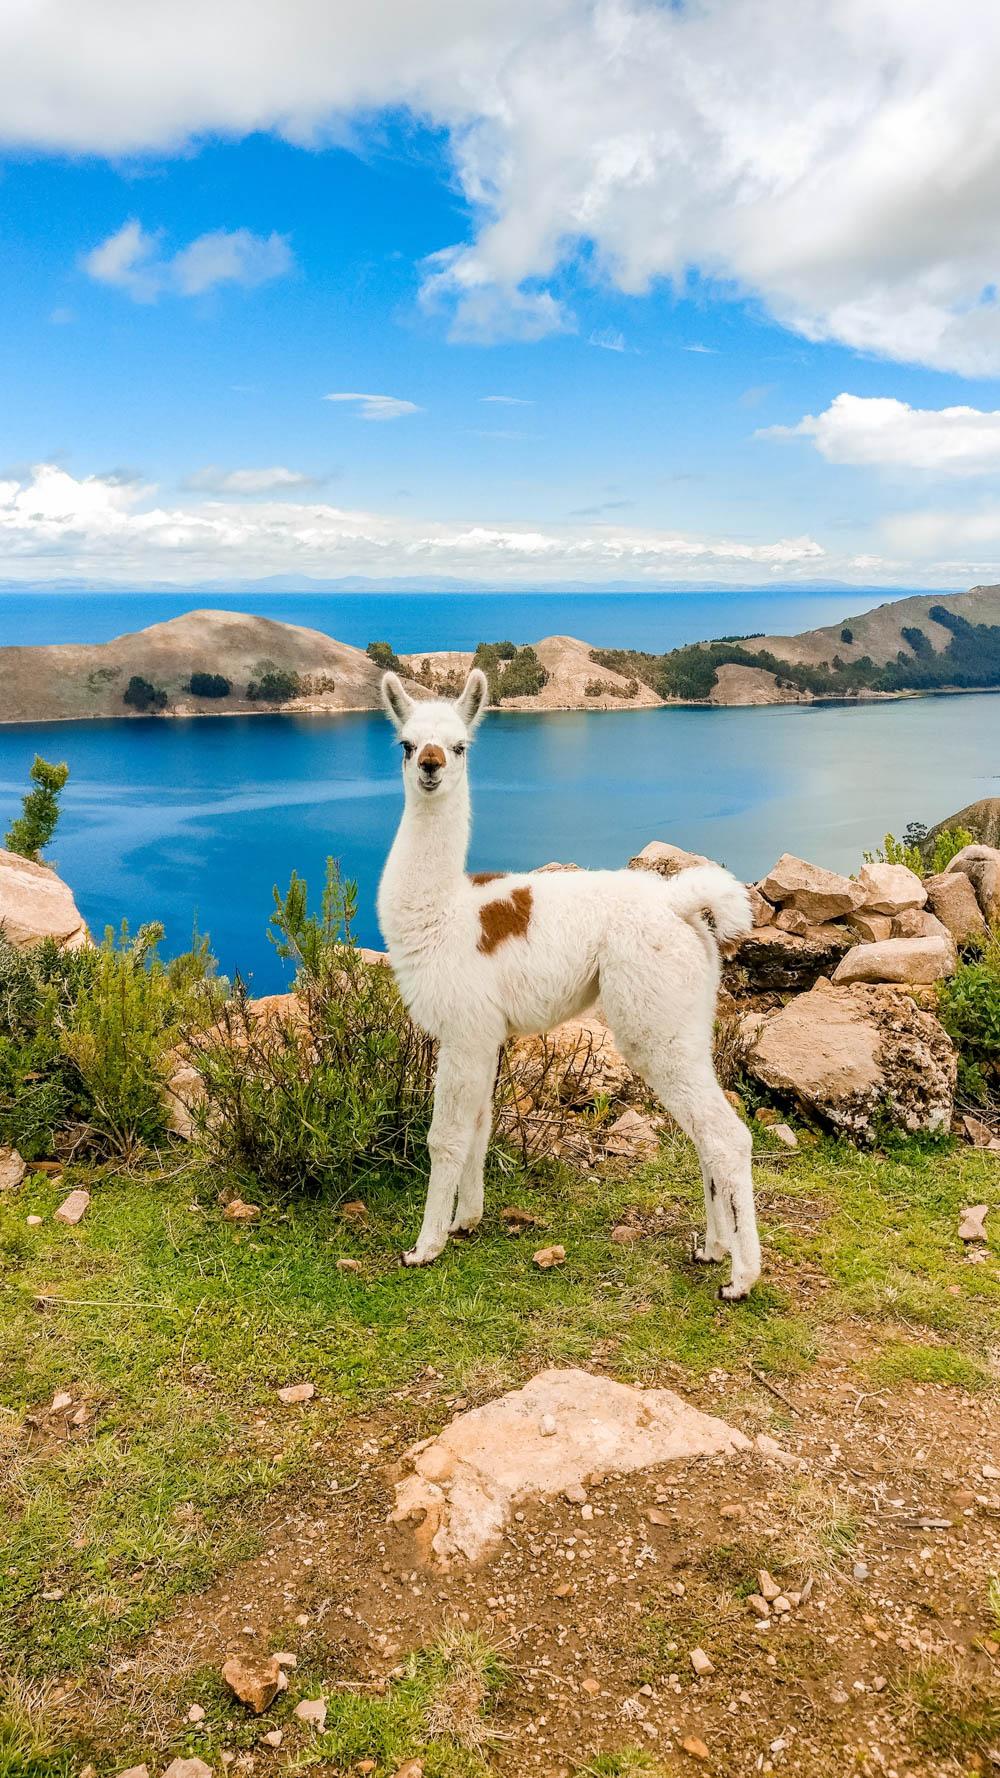 A day trip to Isla del Sol, Bolivia - Aliz's Wonderland